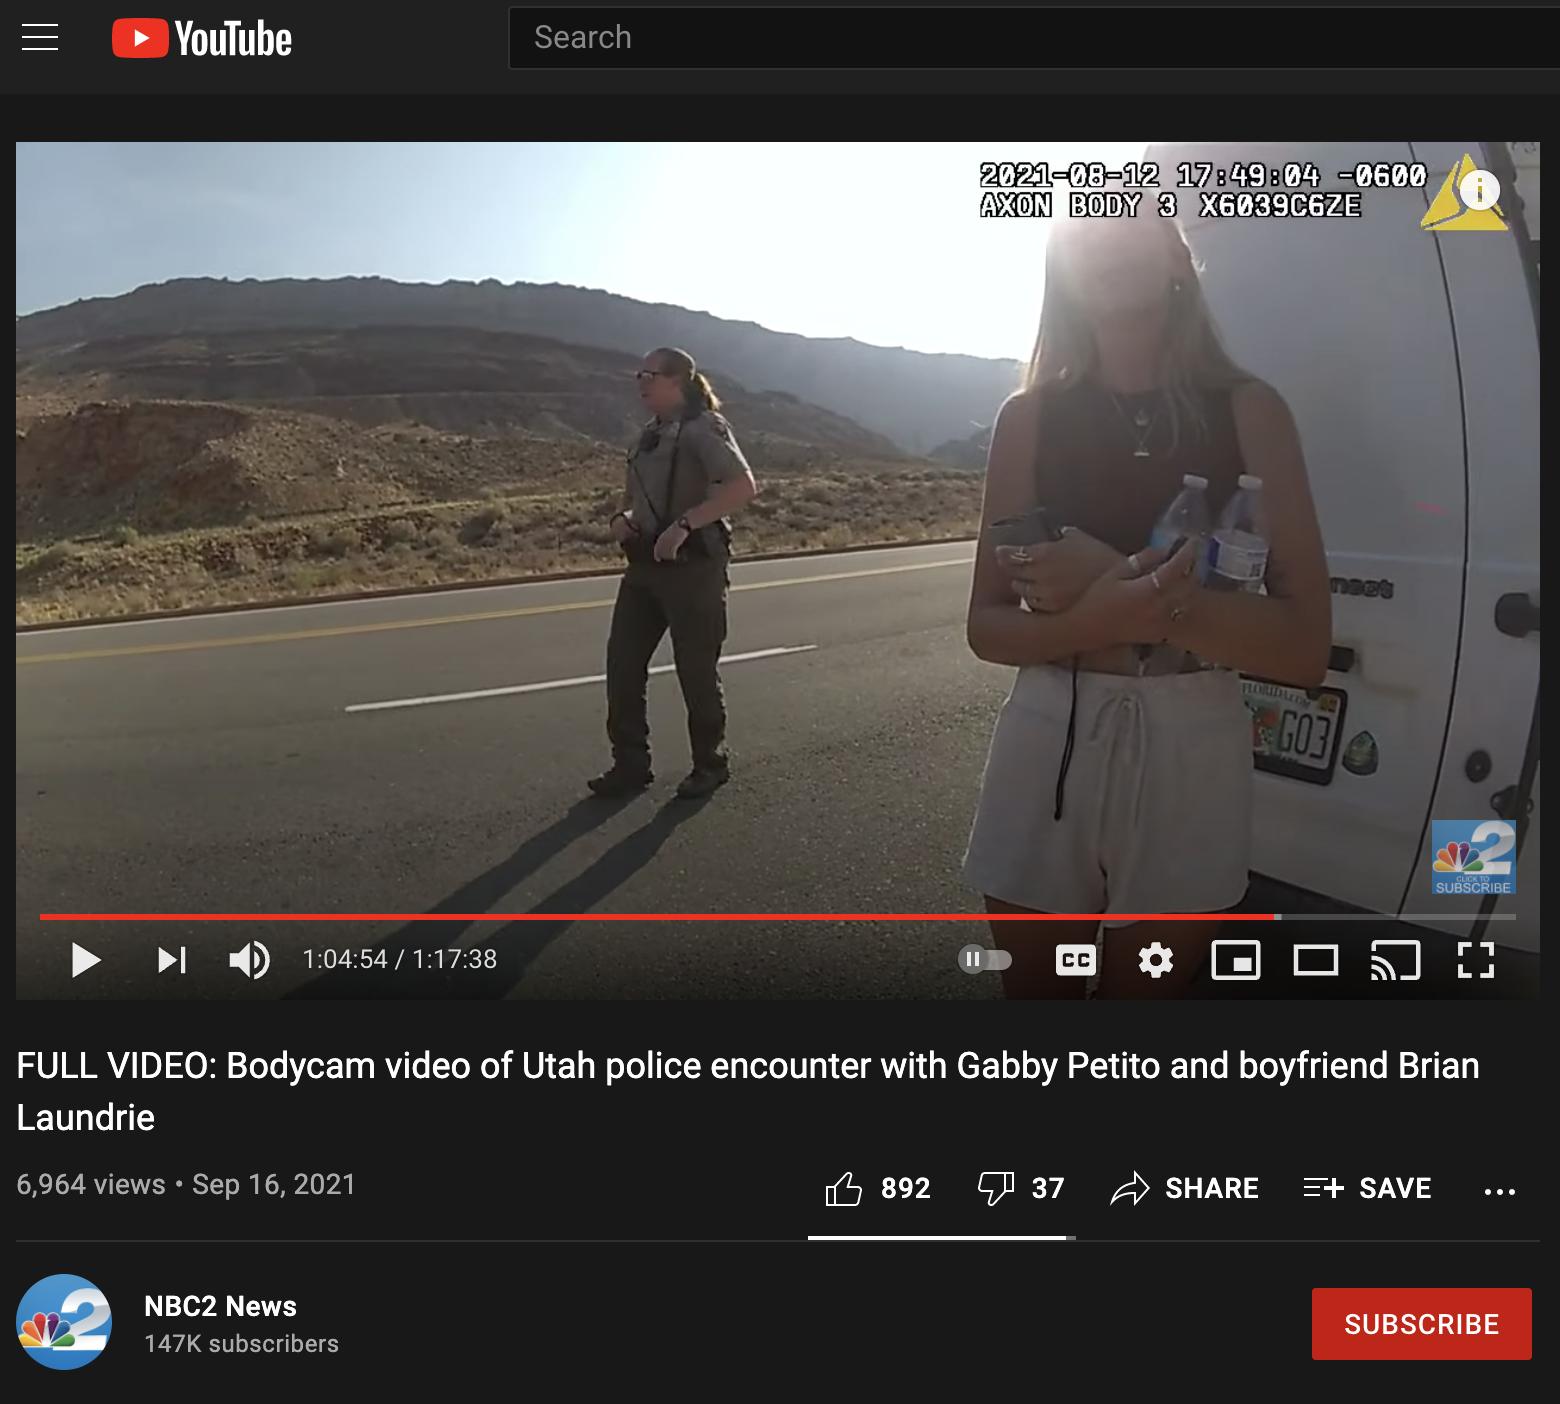 A bodycam video shows Gabby Petito and her boyfriend, Brian Laundrie.